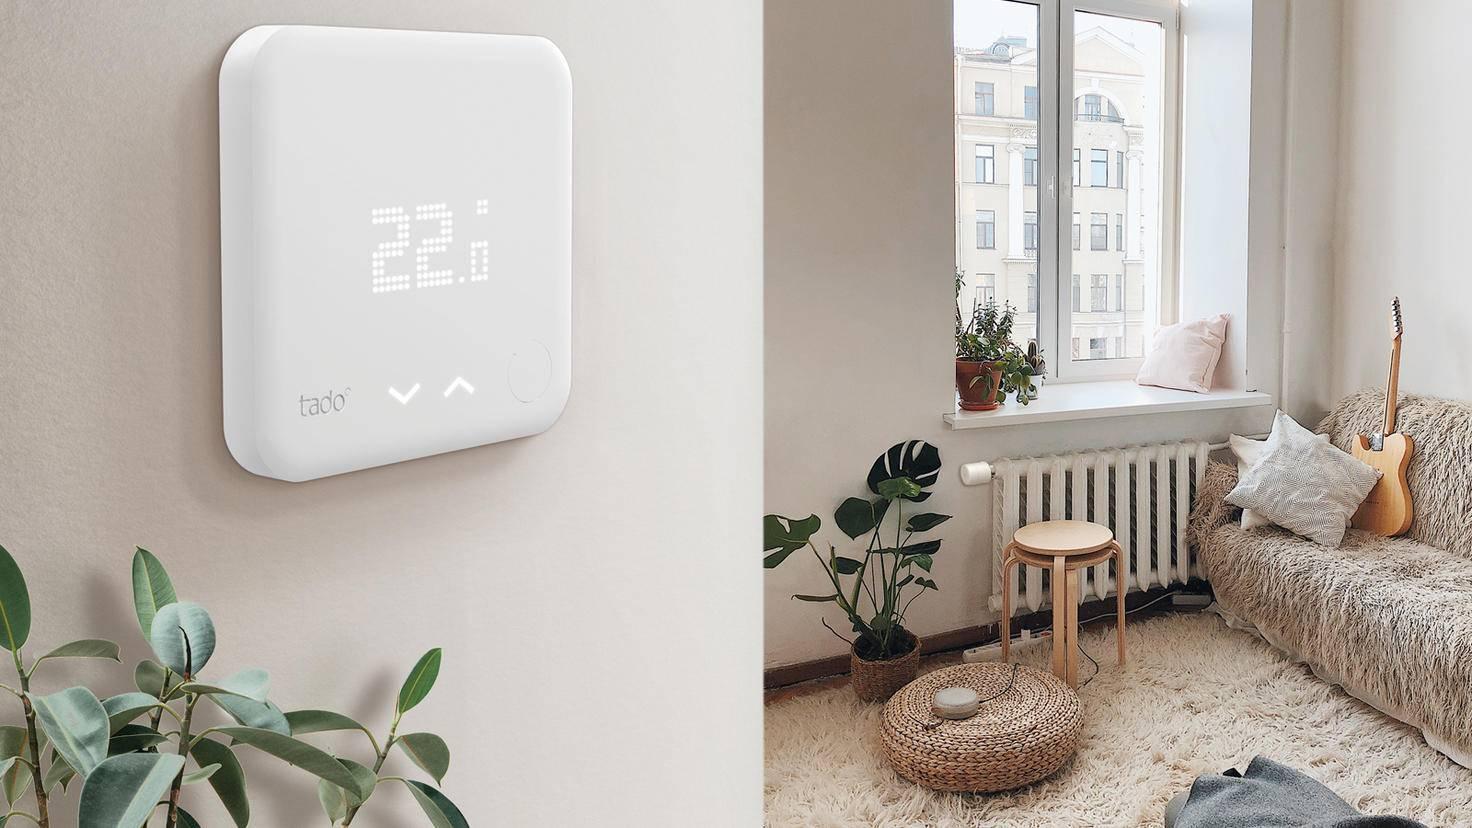 Tado Smart Thermostat-Tado